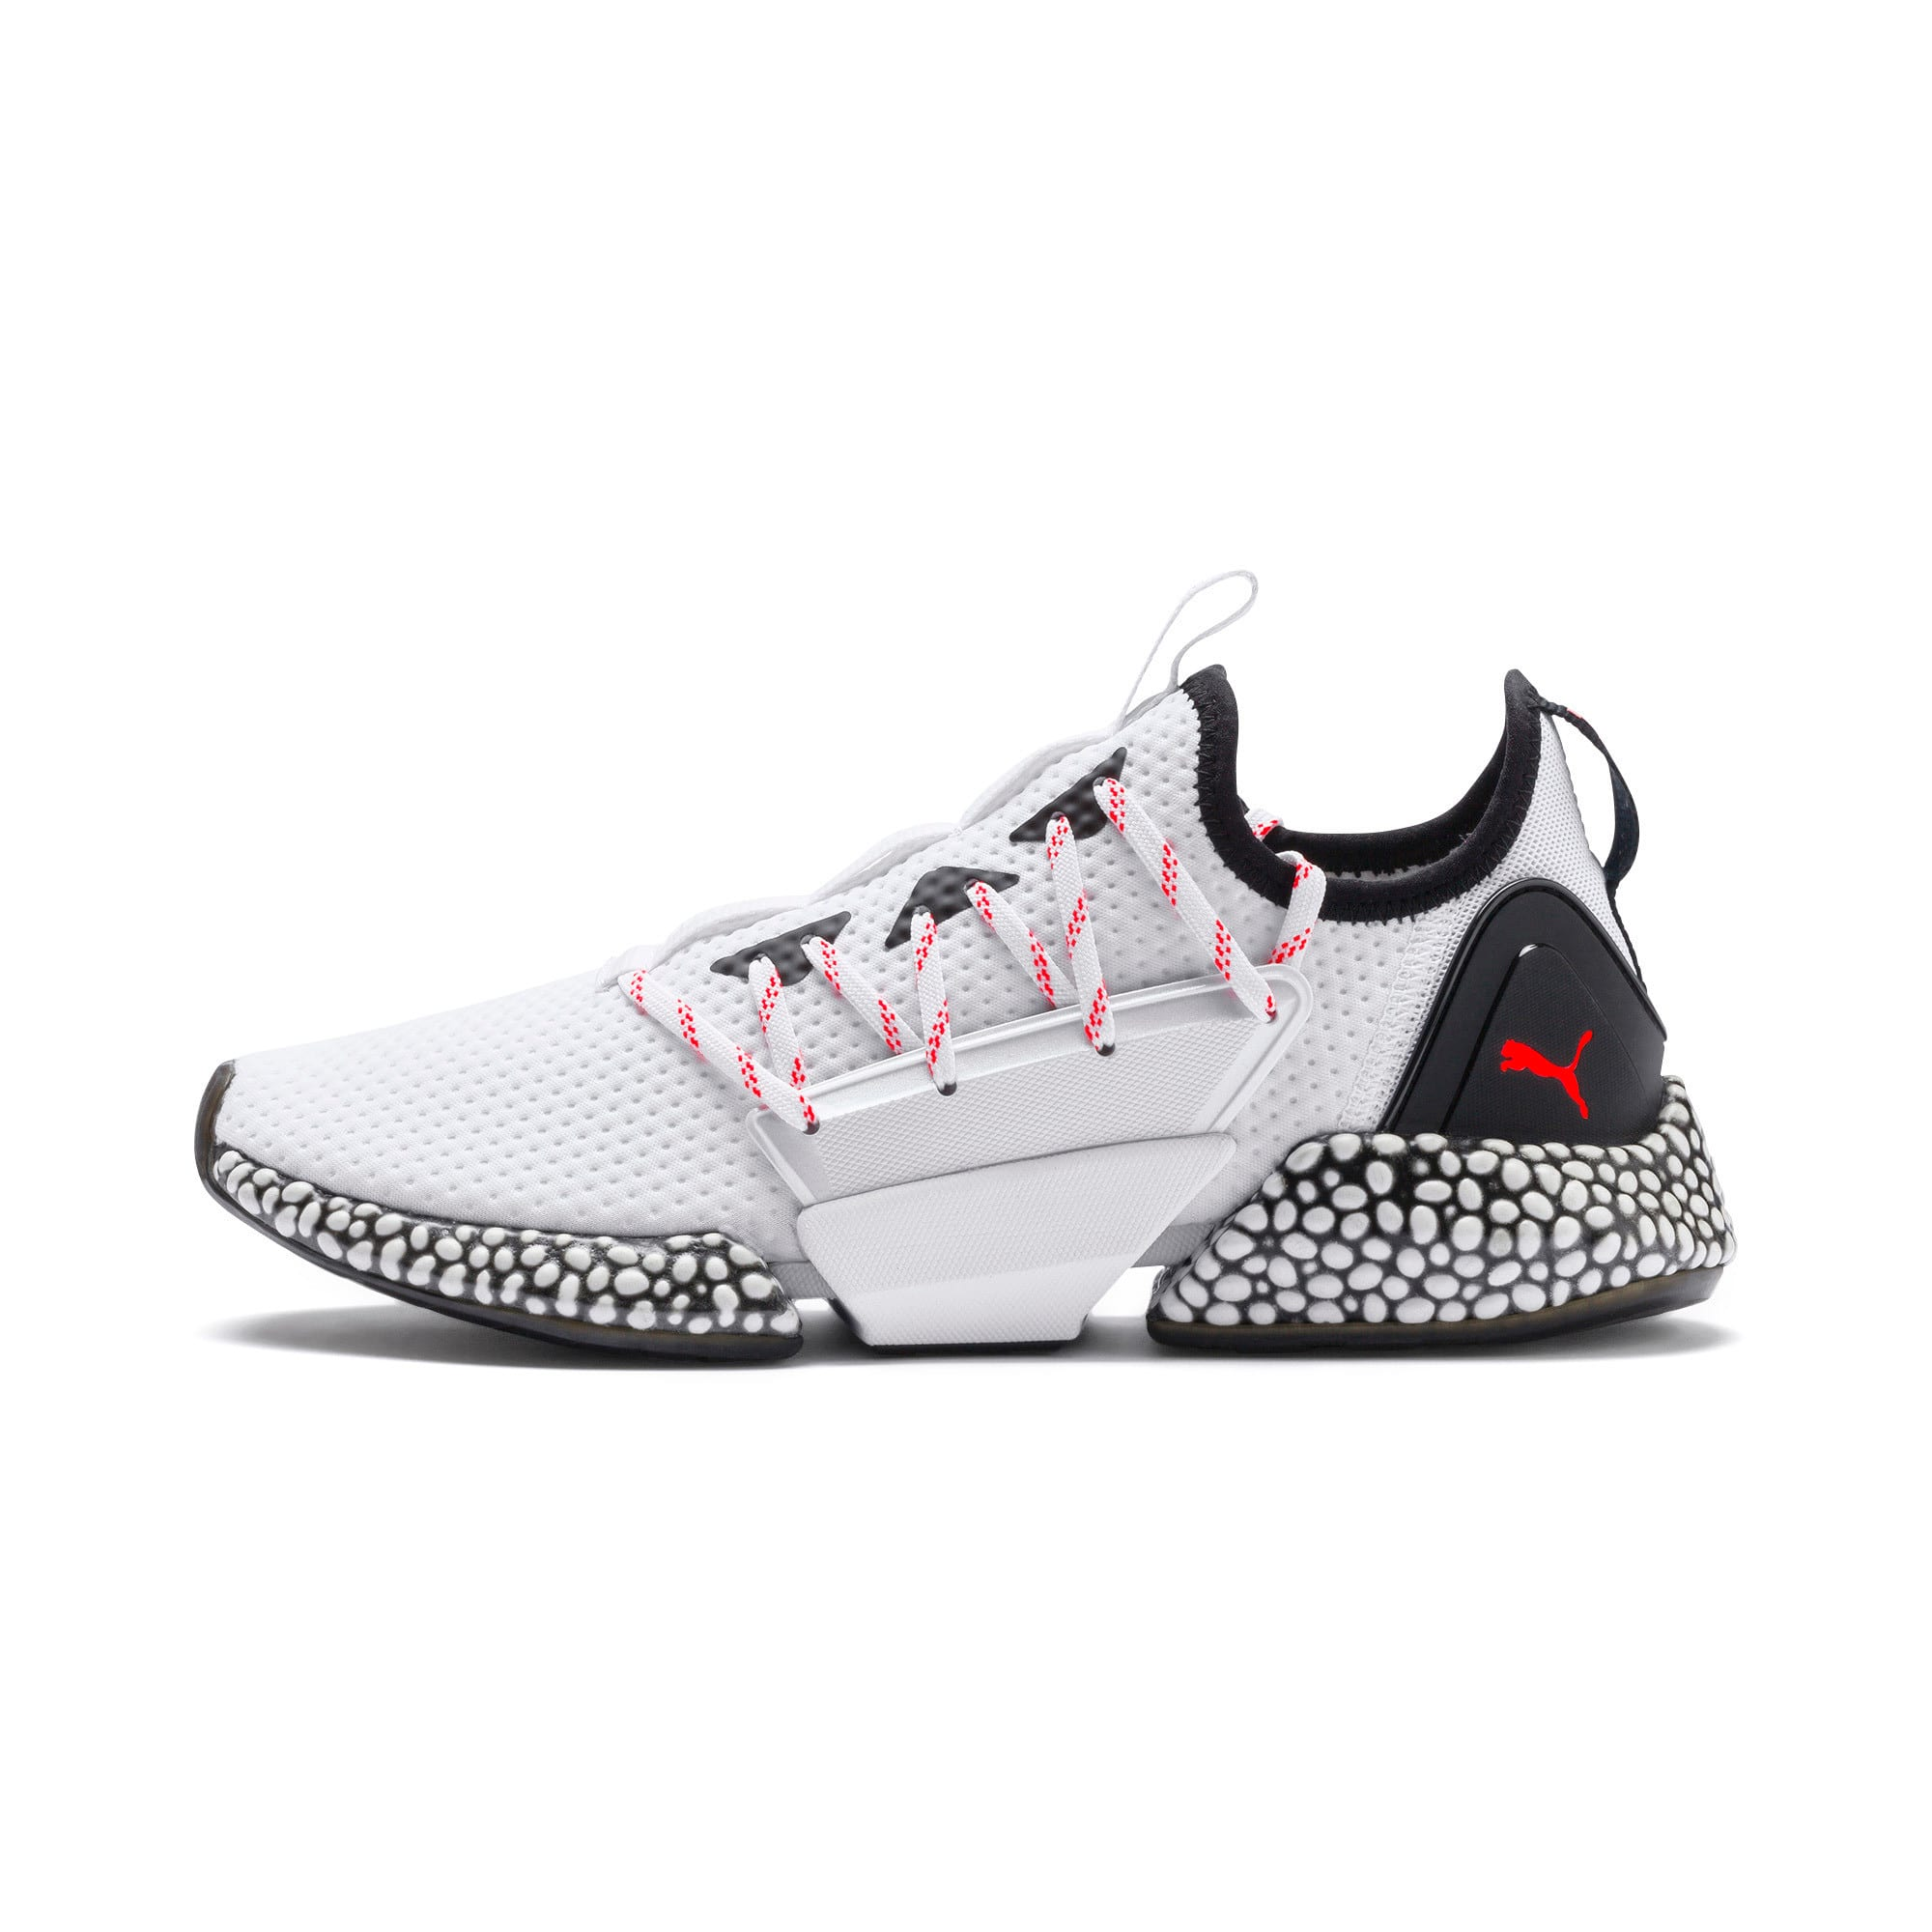 Thumbnail 1 of HYBRID Rocket Aero Men's Running Shoes, Puma White-Puma Black, medium